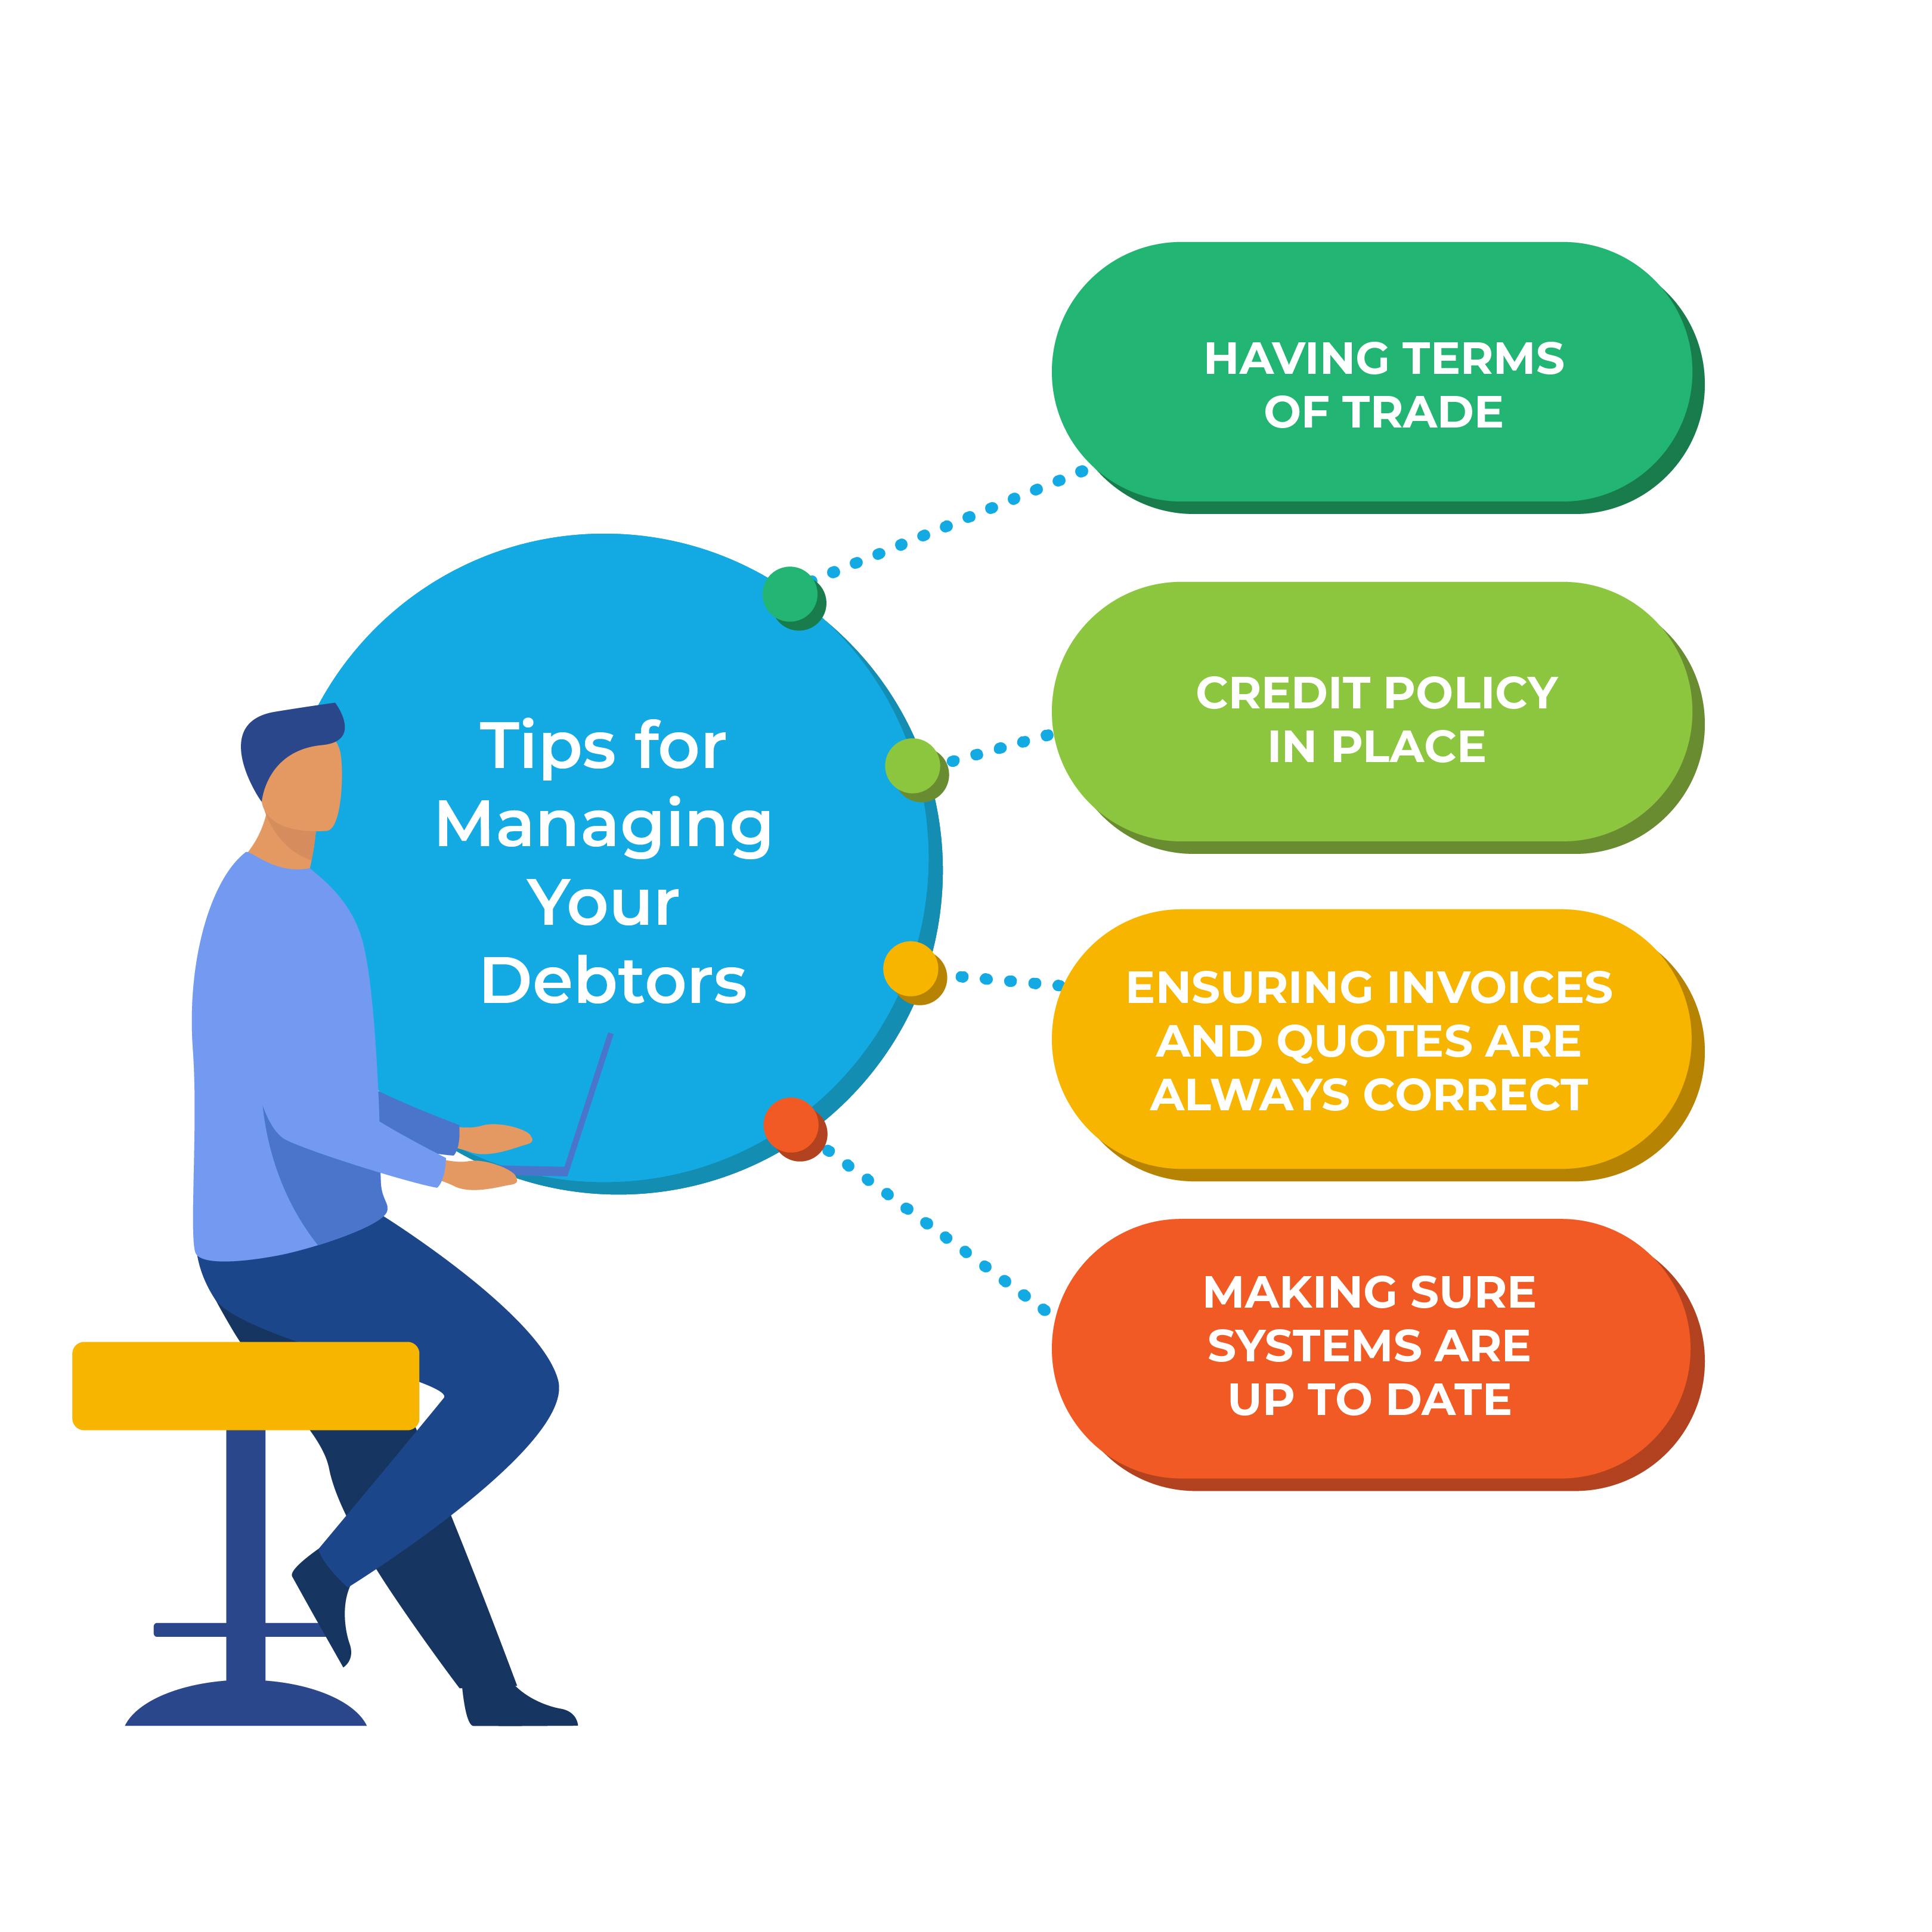 Managing Your Debtors